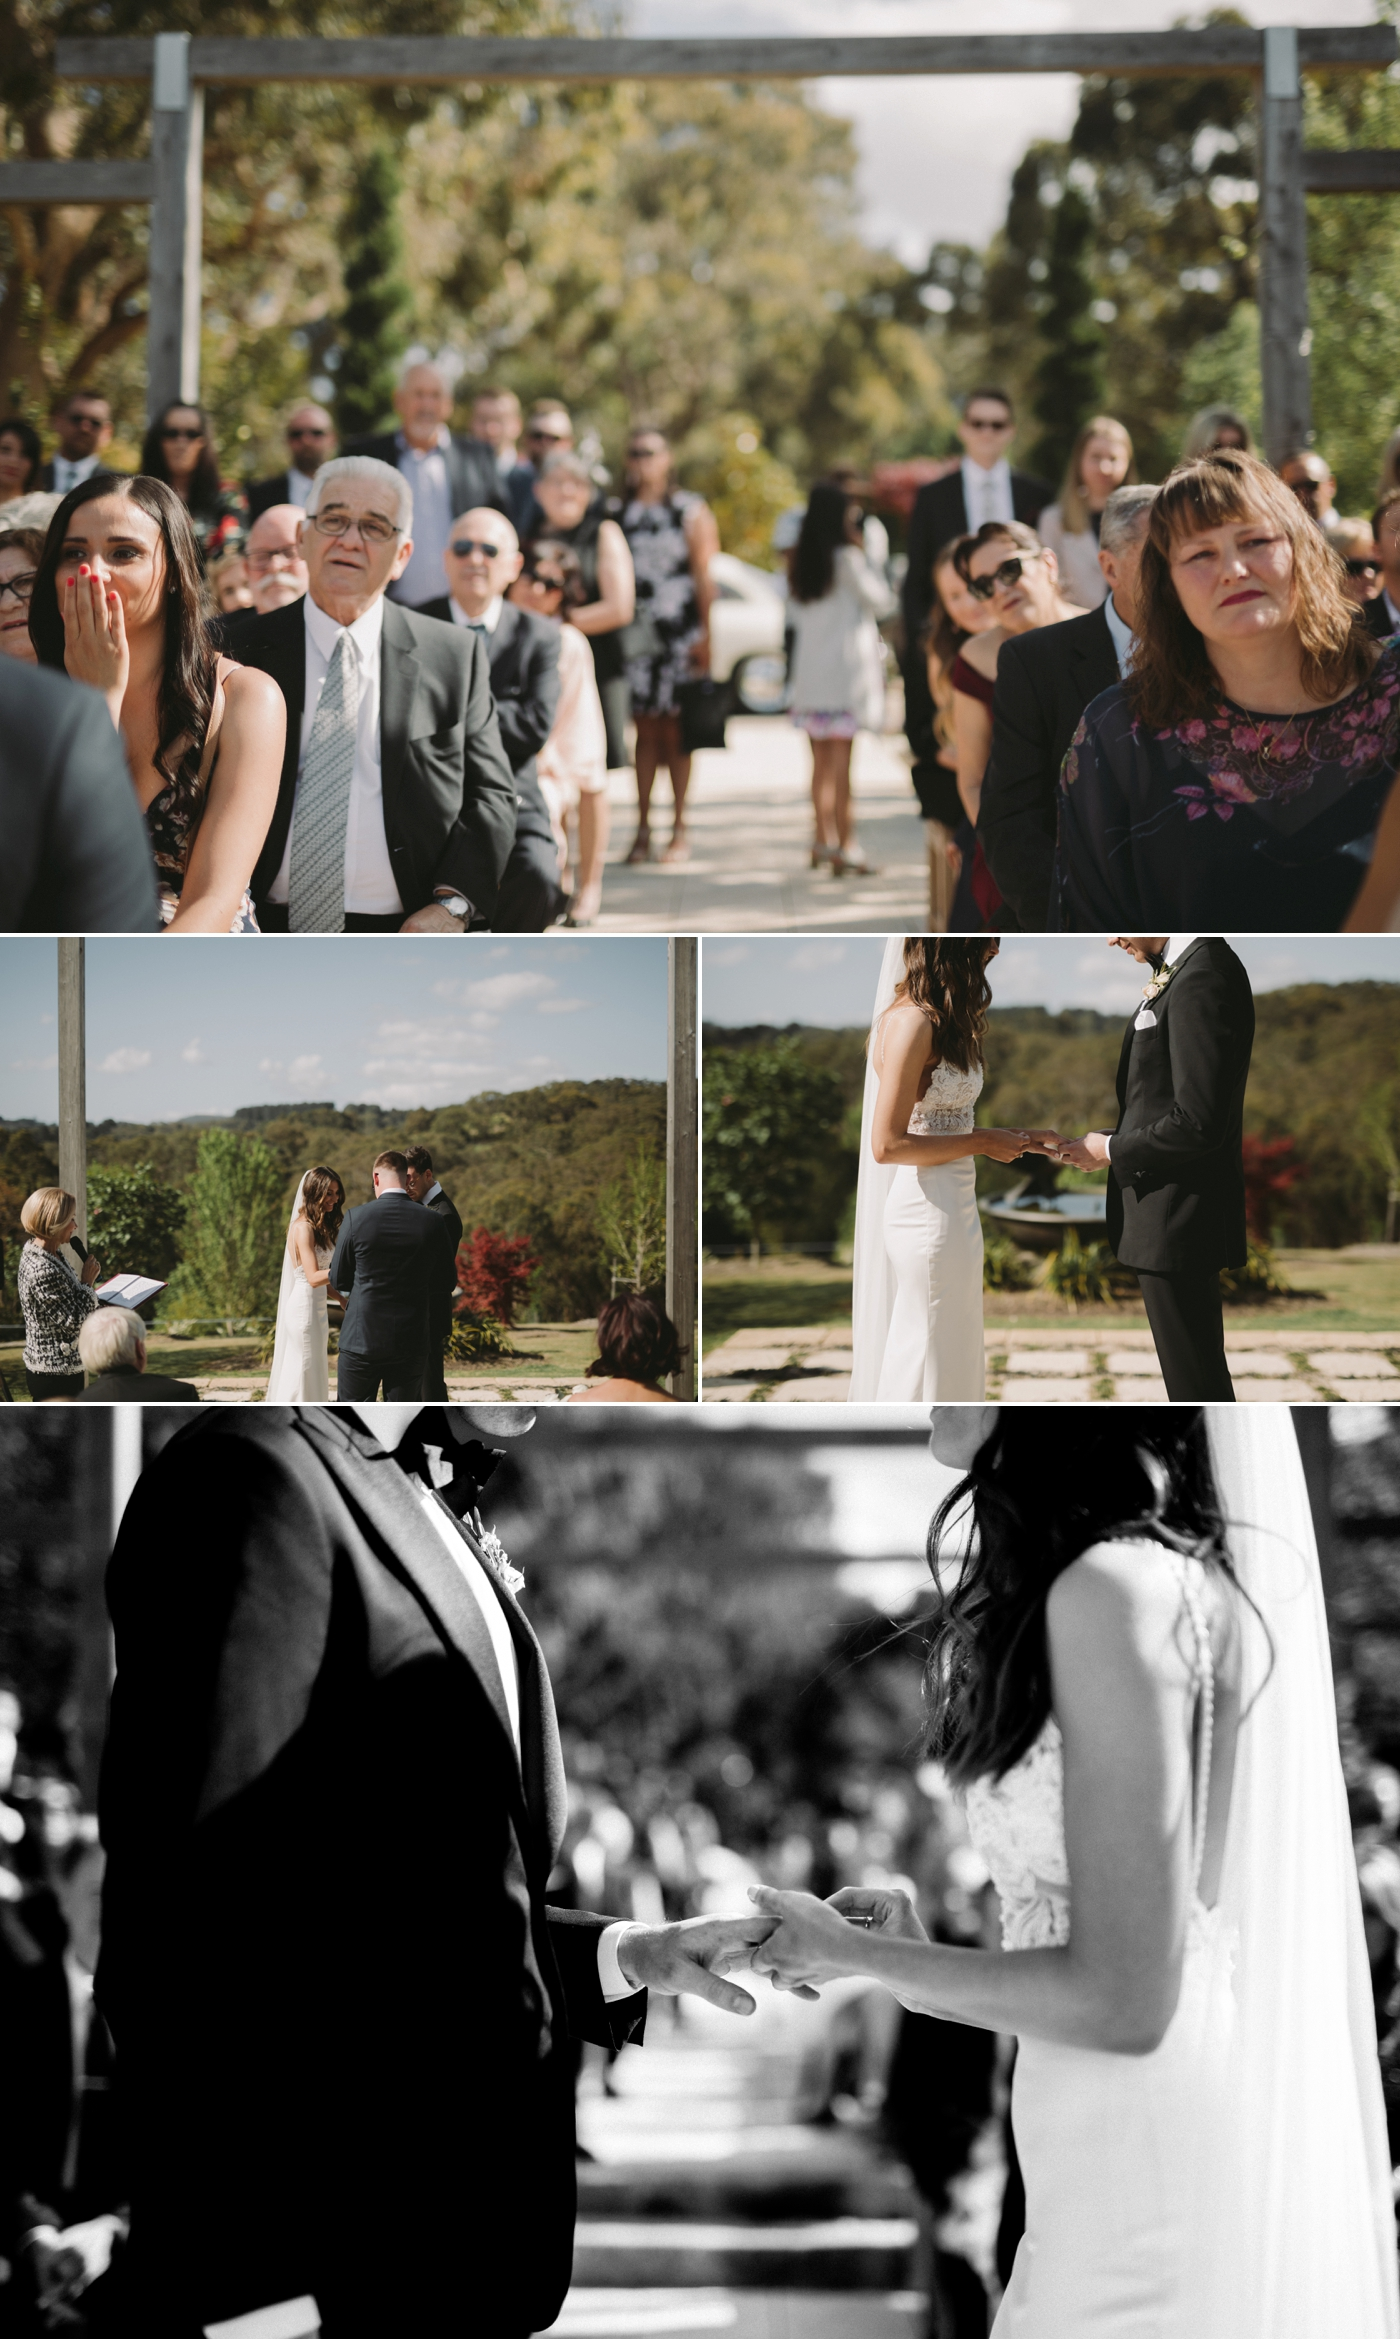 Katie and Ben - Natural Wedding Photography in Adelaide - Beautiful, Candid Wedding Photographer - Adelaide Hills Wedding - Katherine Schultz - www.katherineschultzphotography.com_0033.jpg